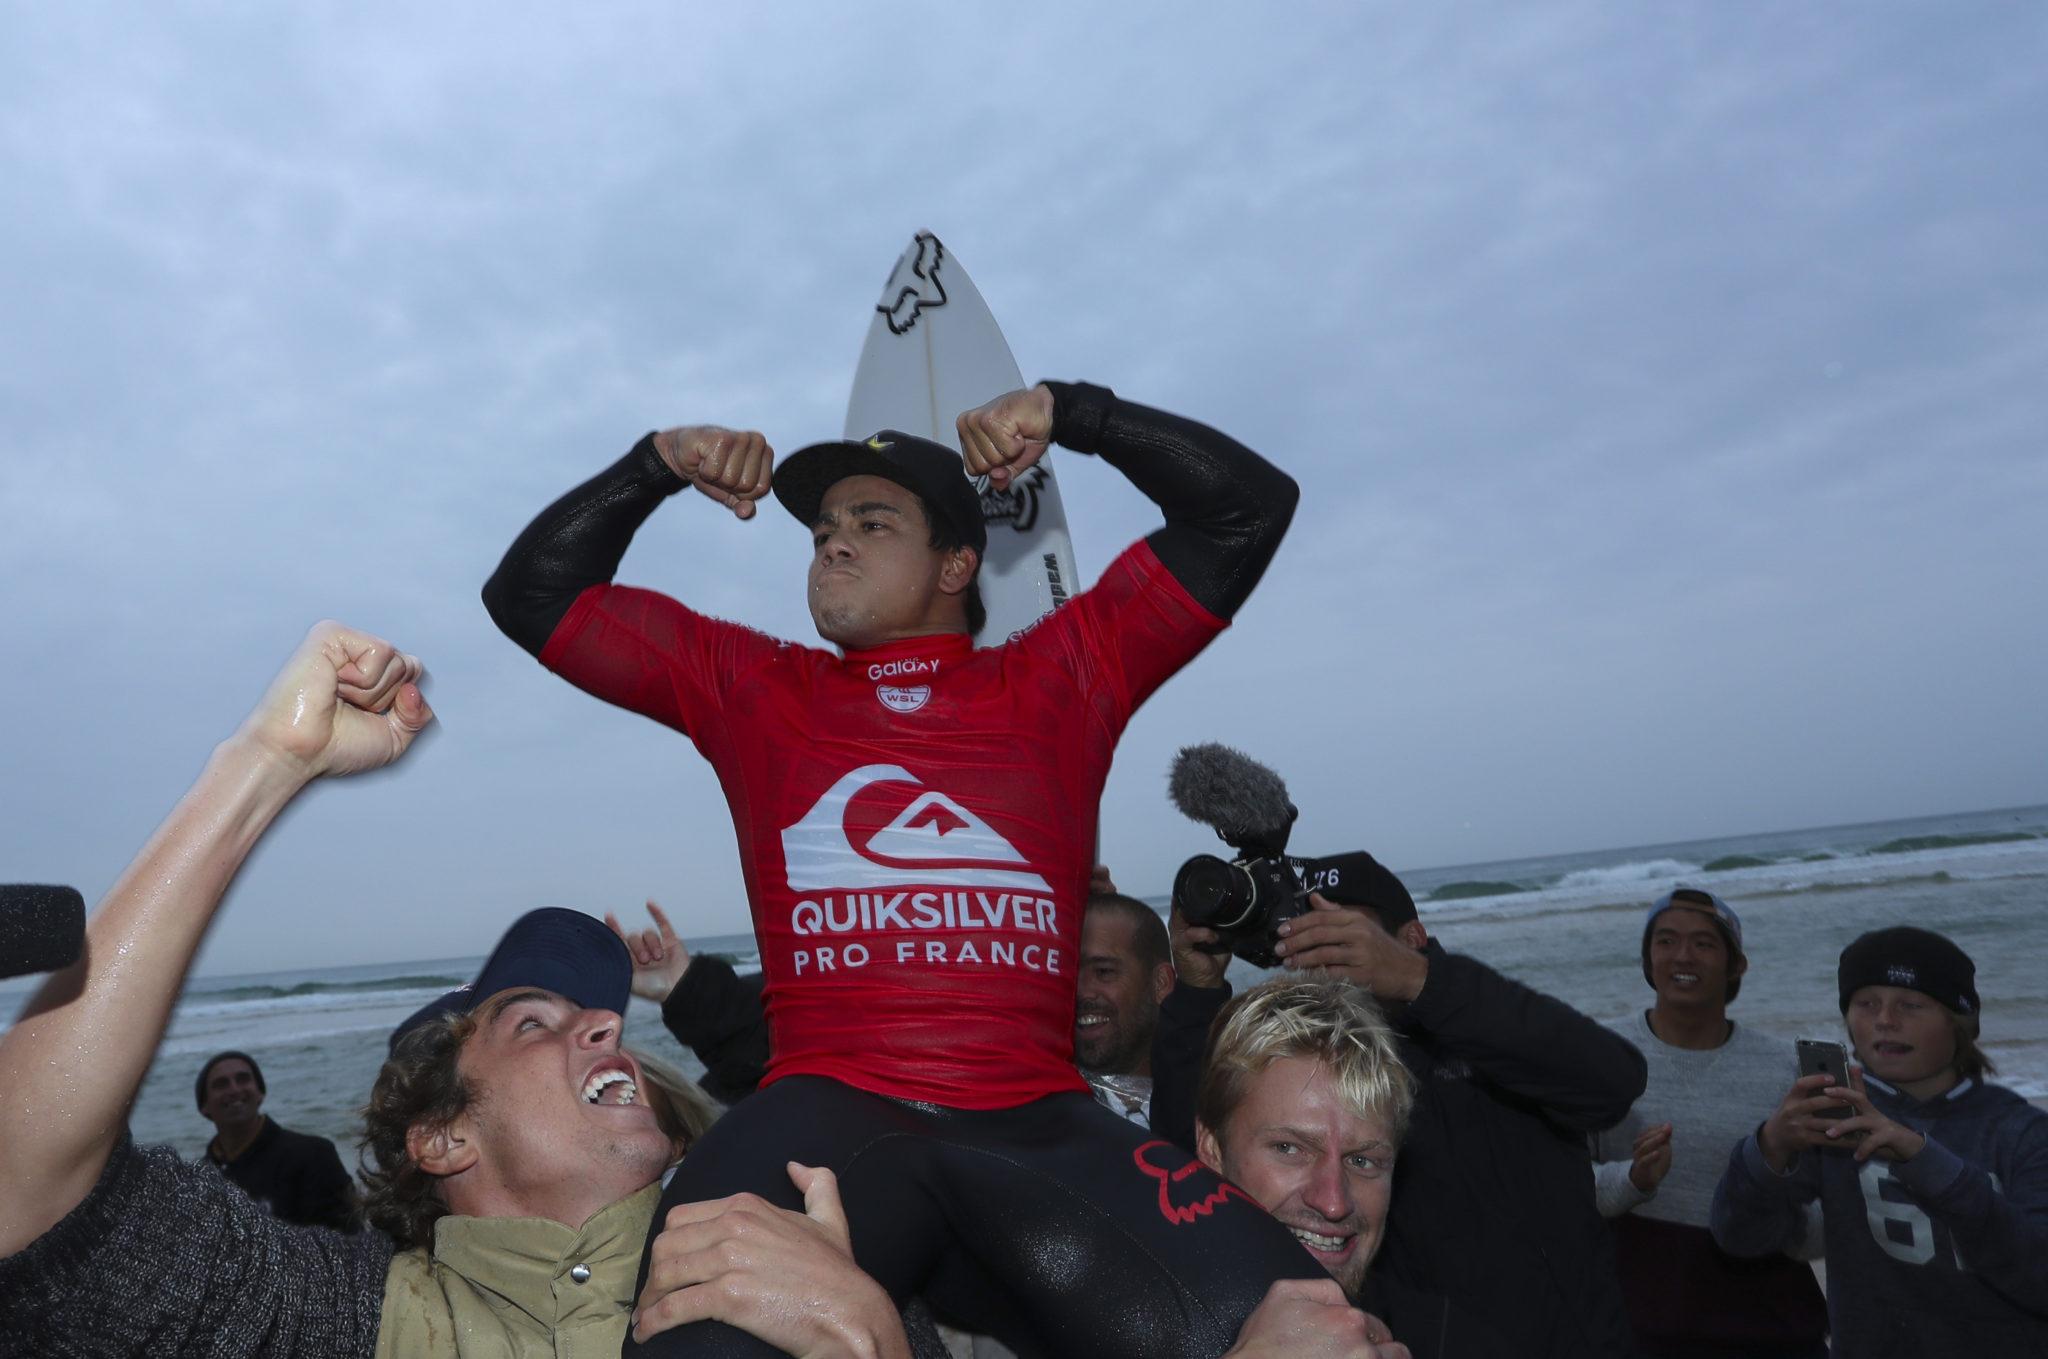 Keanu Asing winning the Quiksilver Pro France.